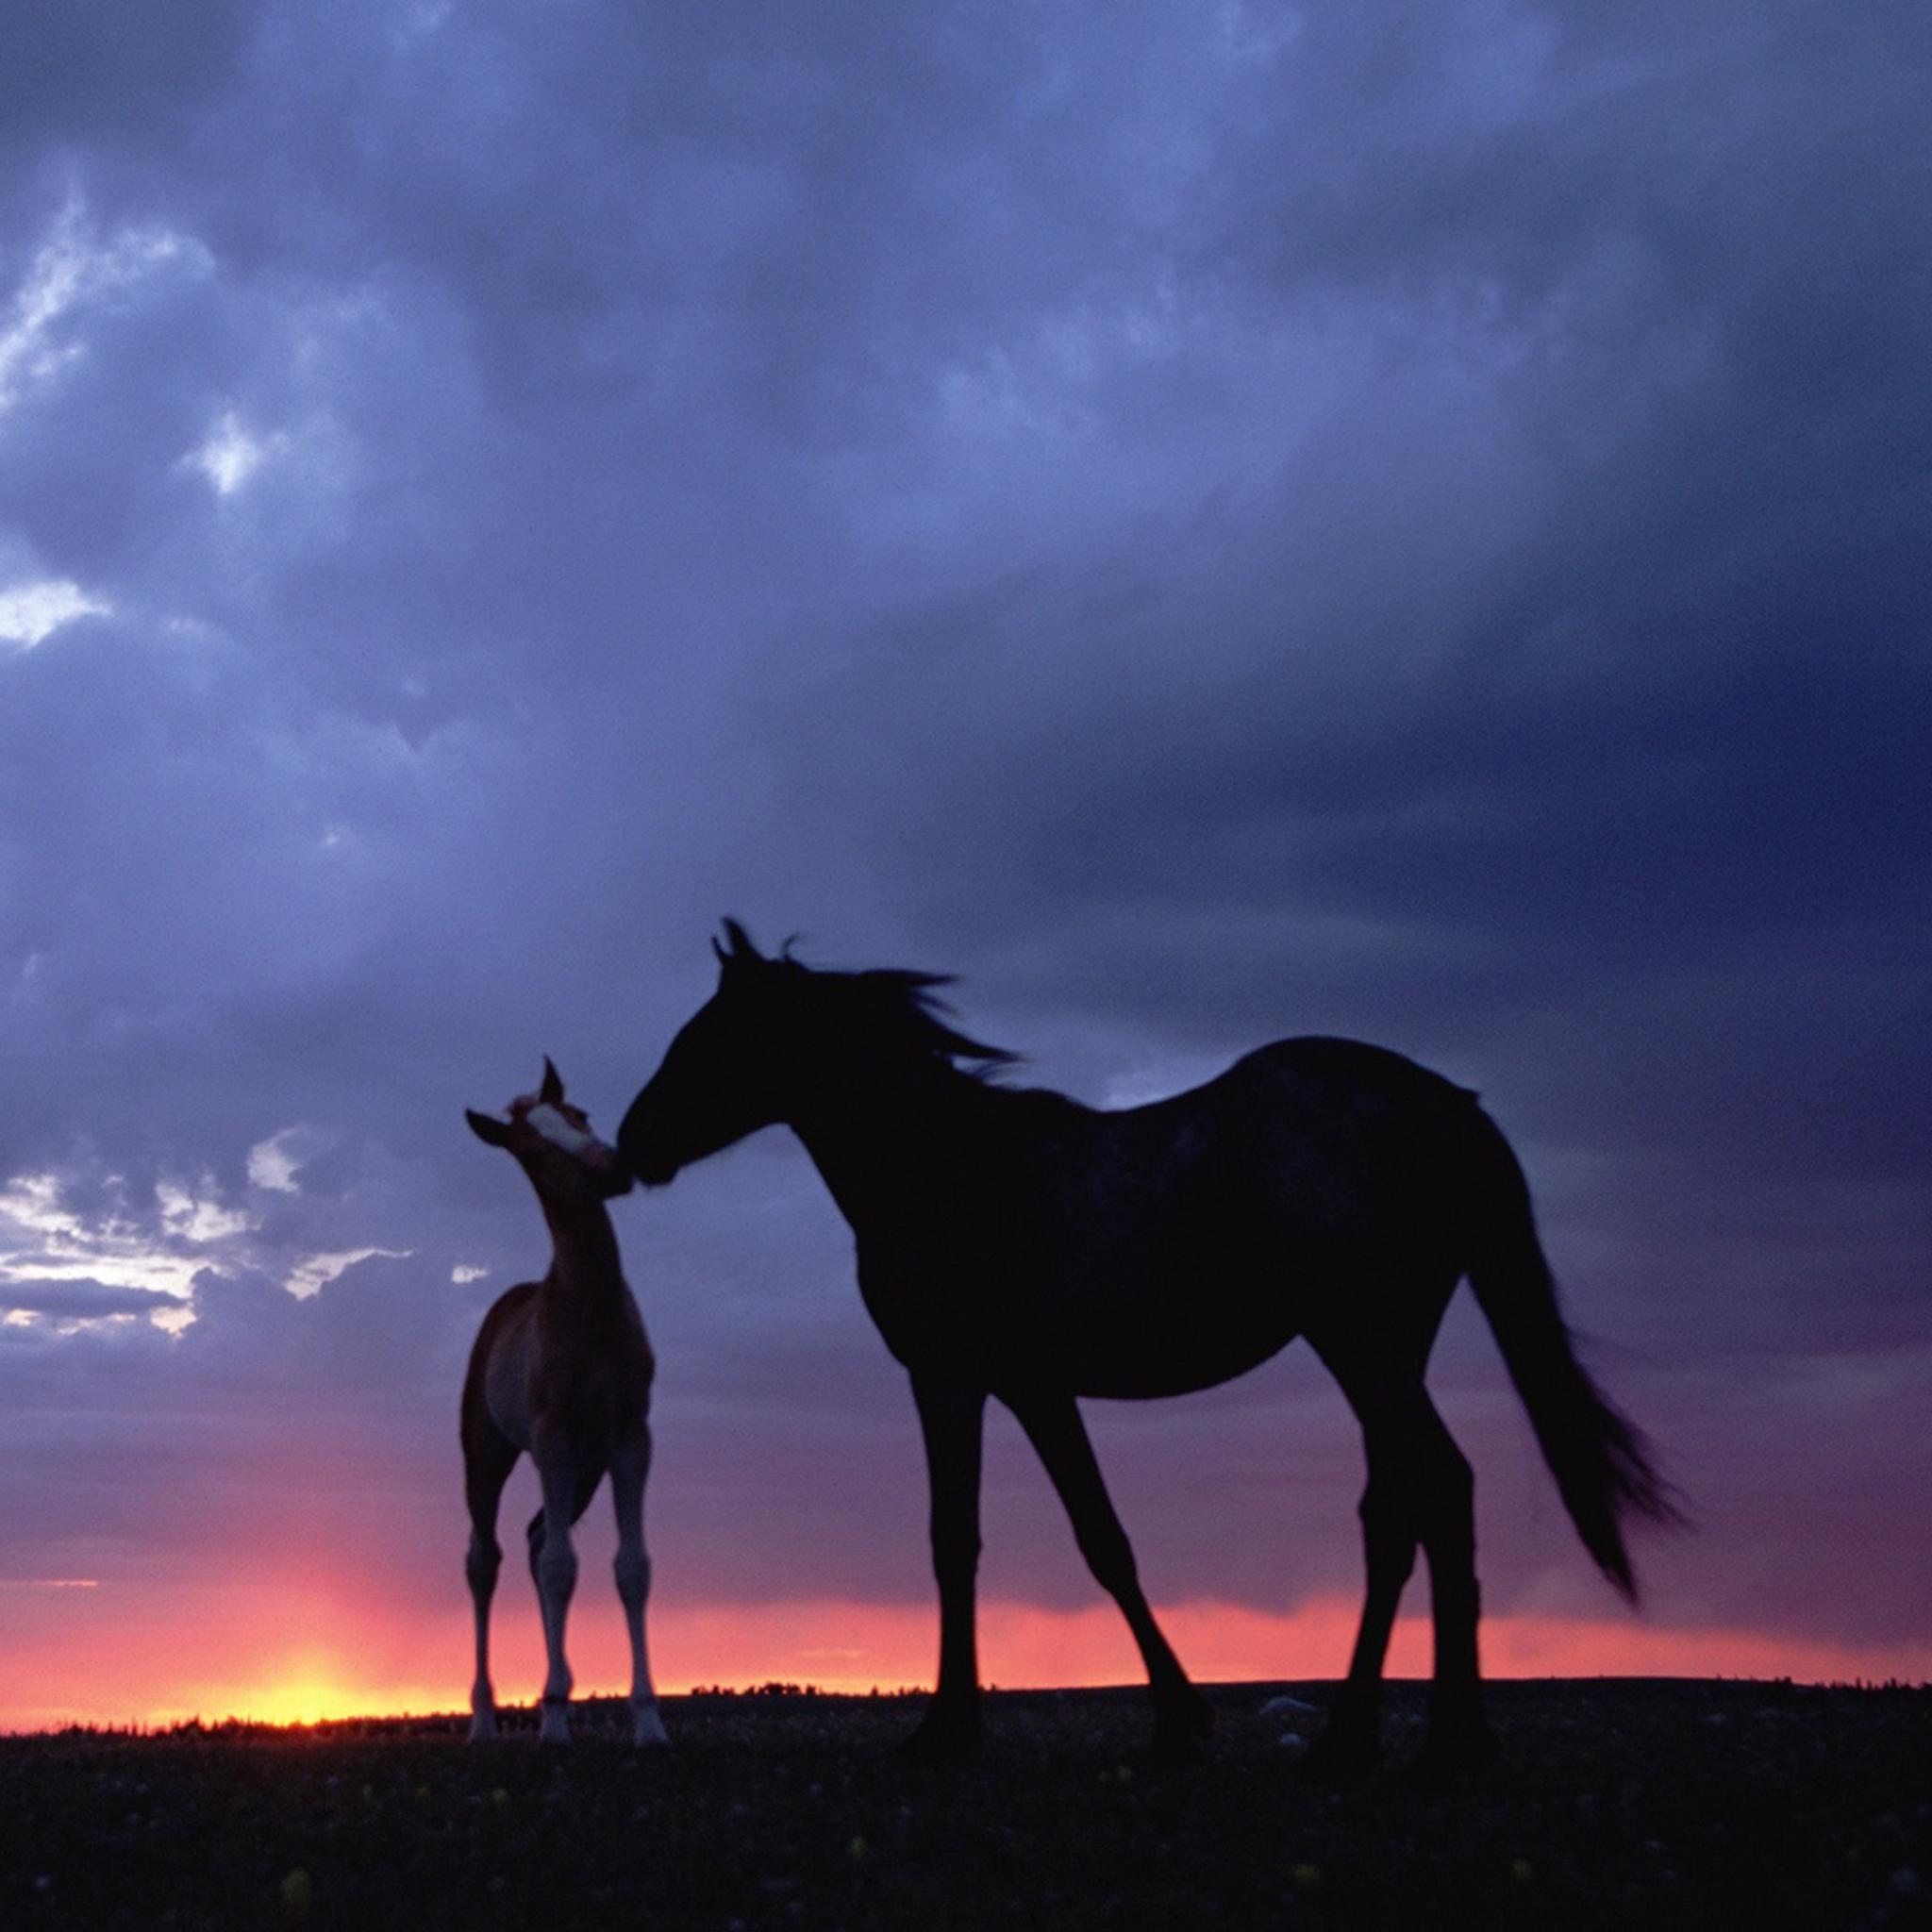 Intimate Horse In Grassland IPad Air Wallpaper